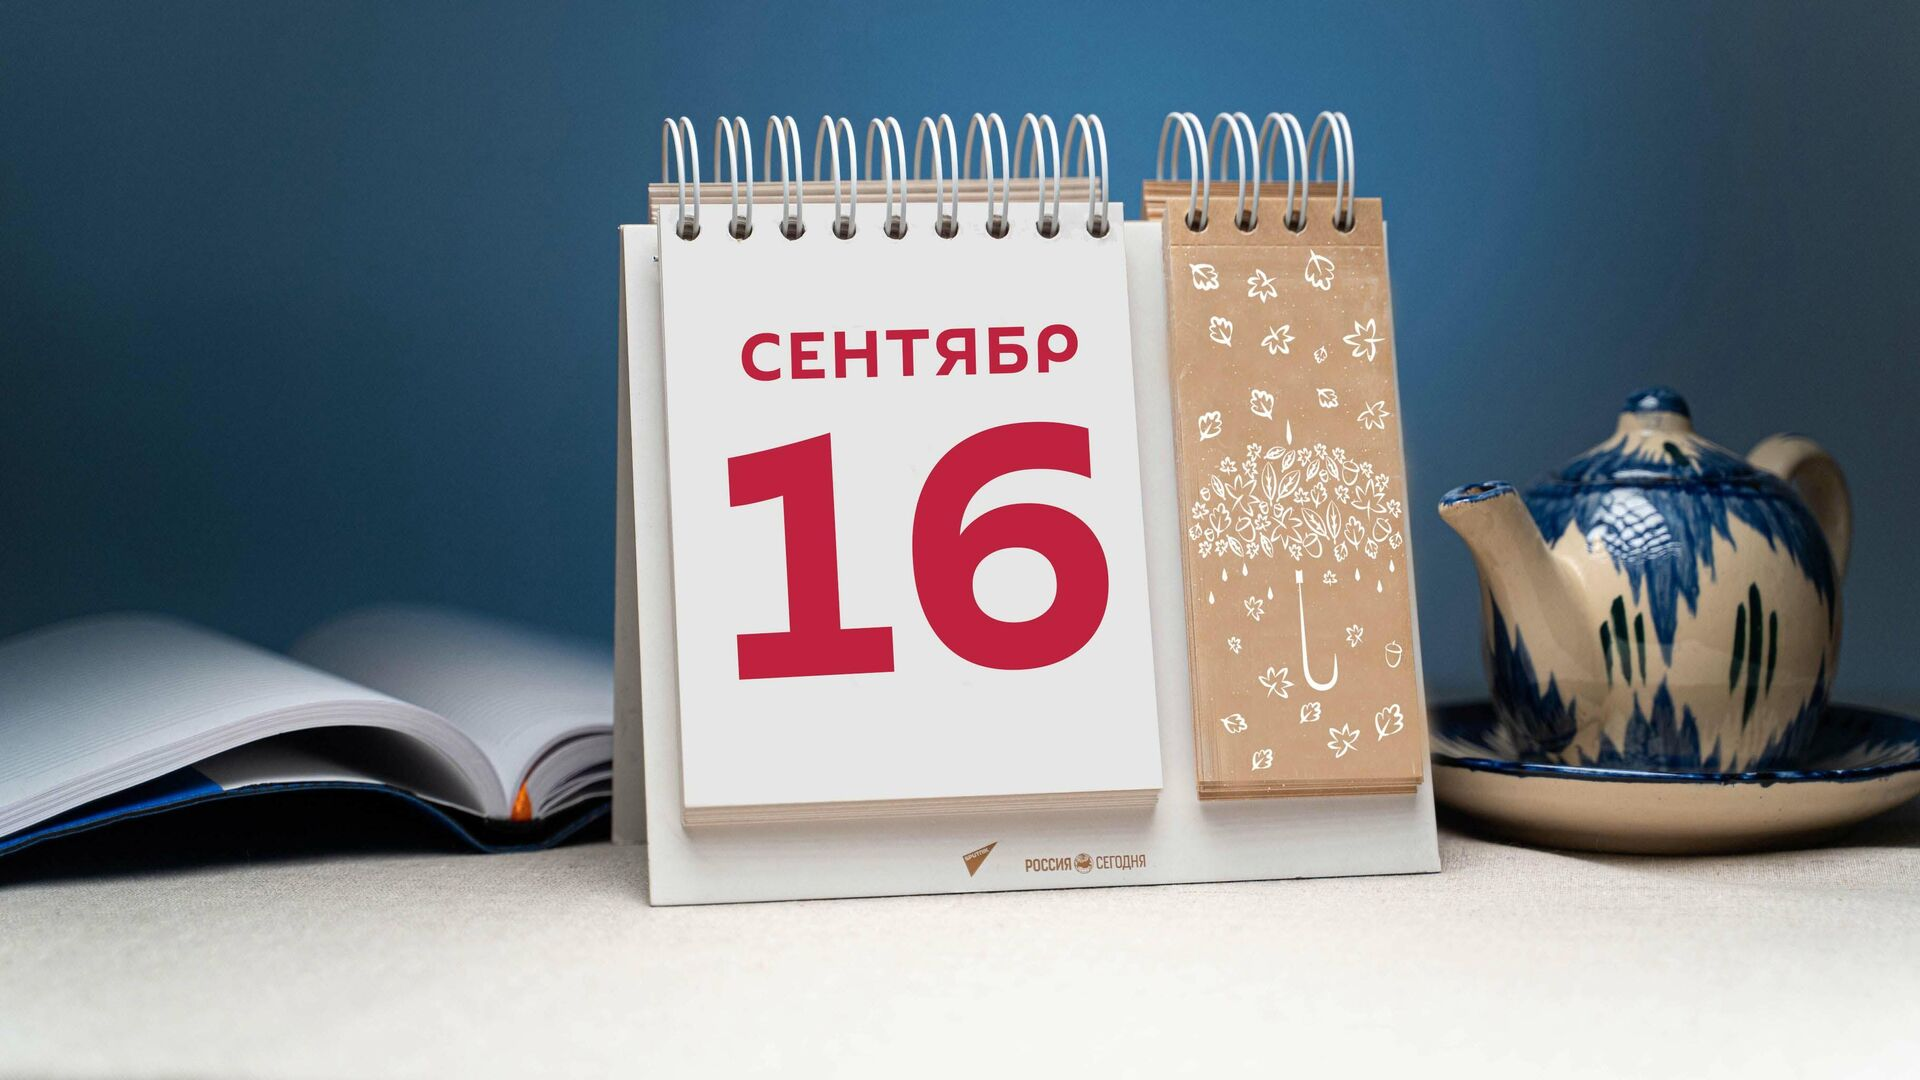 День 16 сентября - Sputnik Тоҷикистон, 1920, 16.09.2021